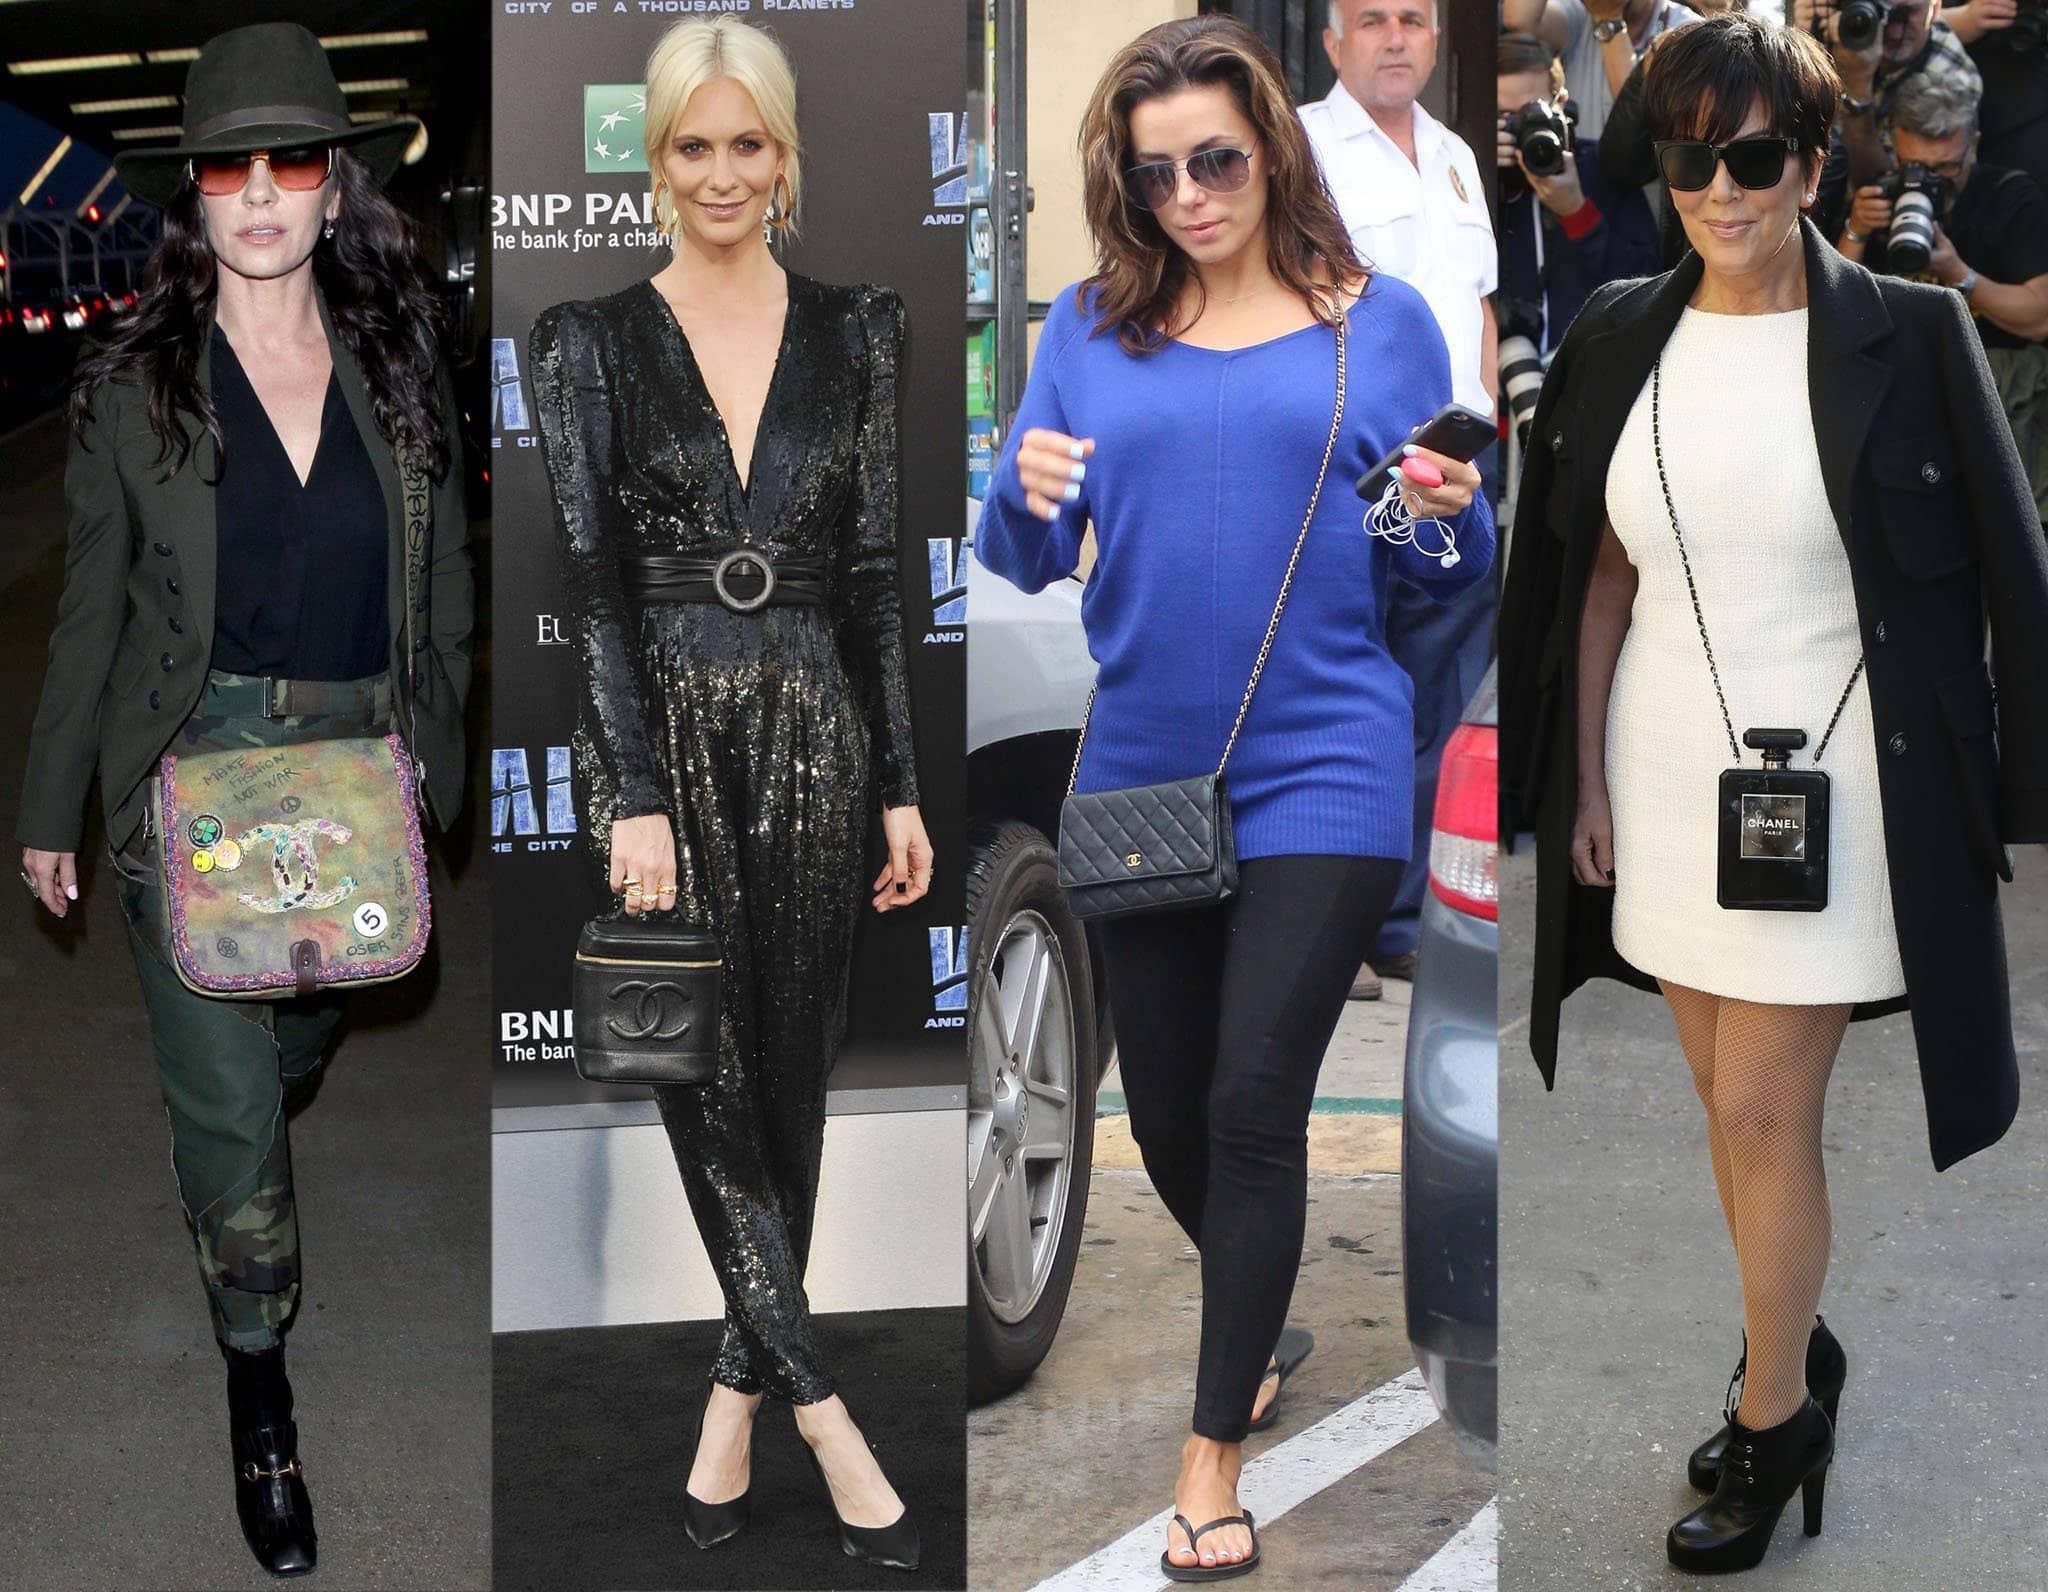 Catherine Zeta-Jones, Poppy Delevingne, Eva Longoria, and Kris Jenner carry different styles of Chanel bag